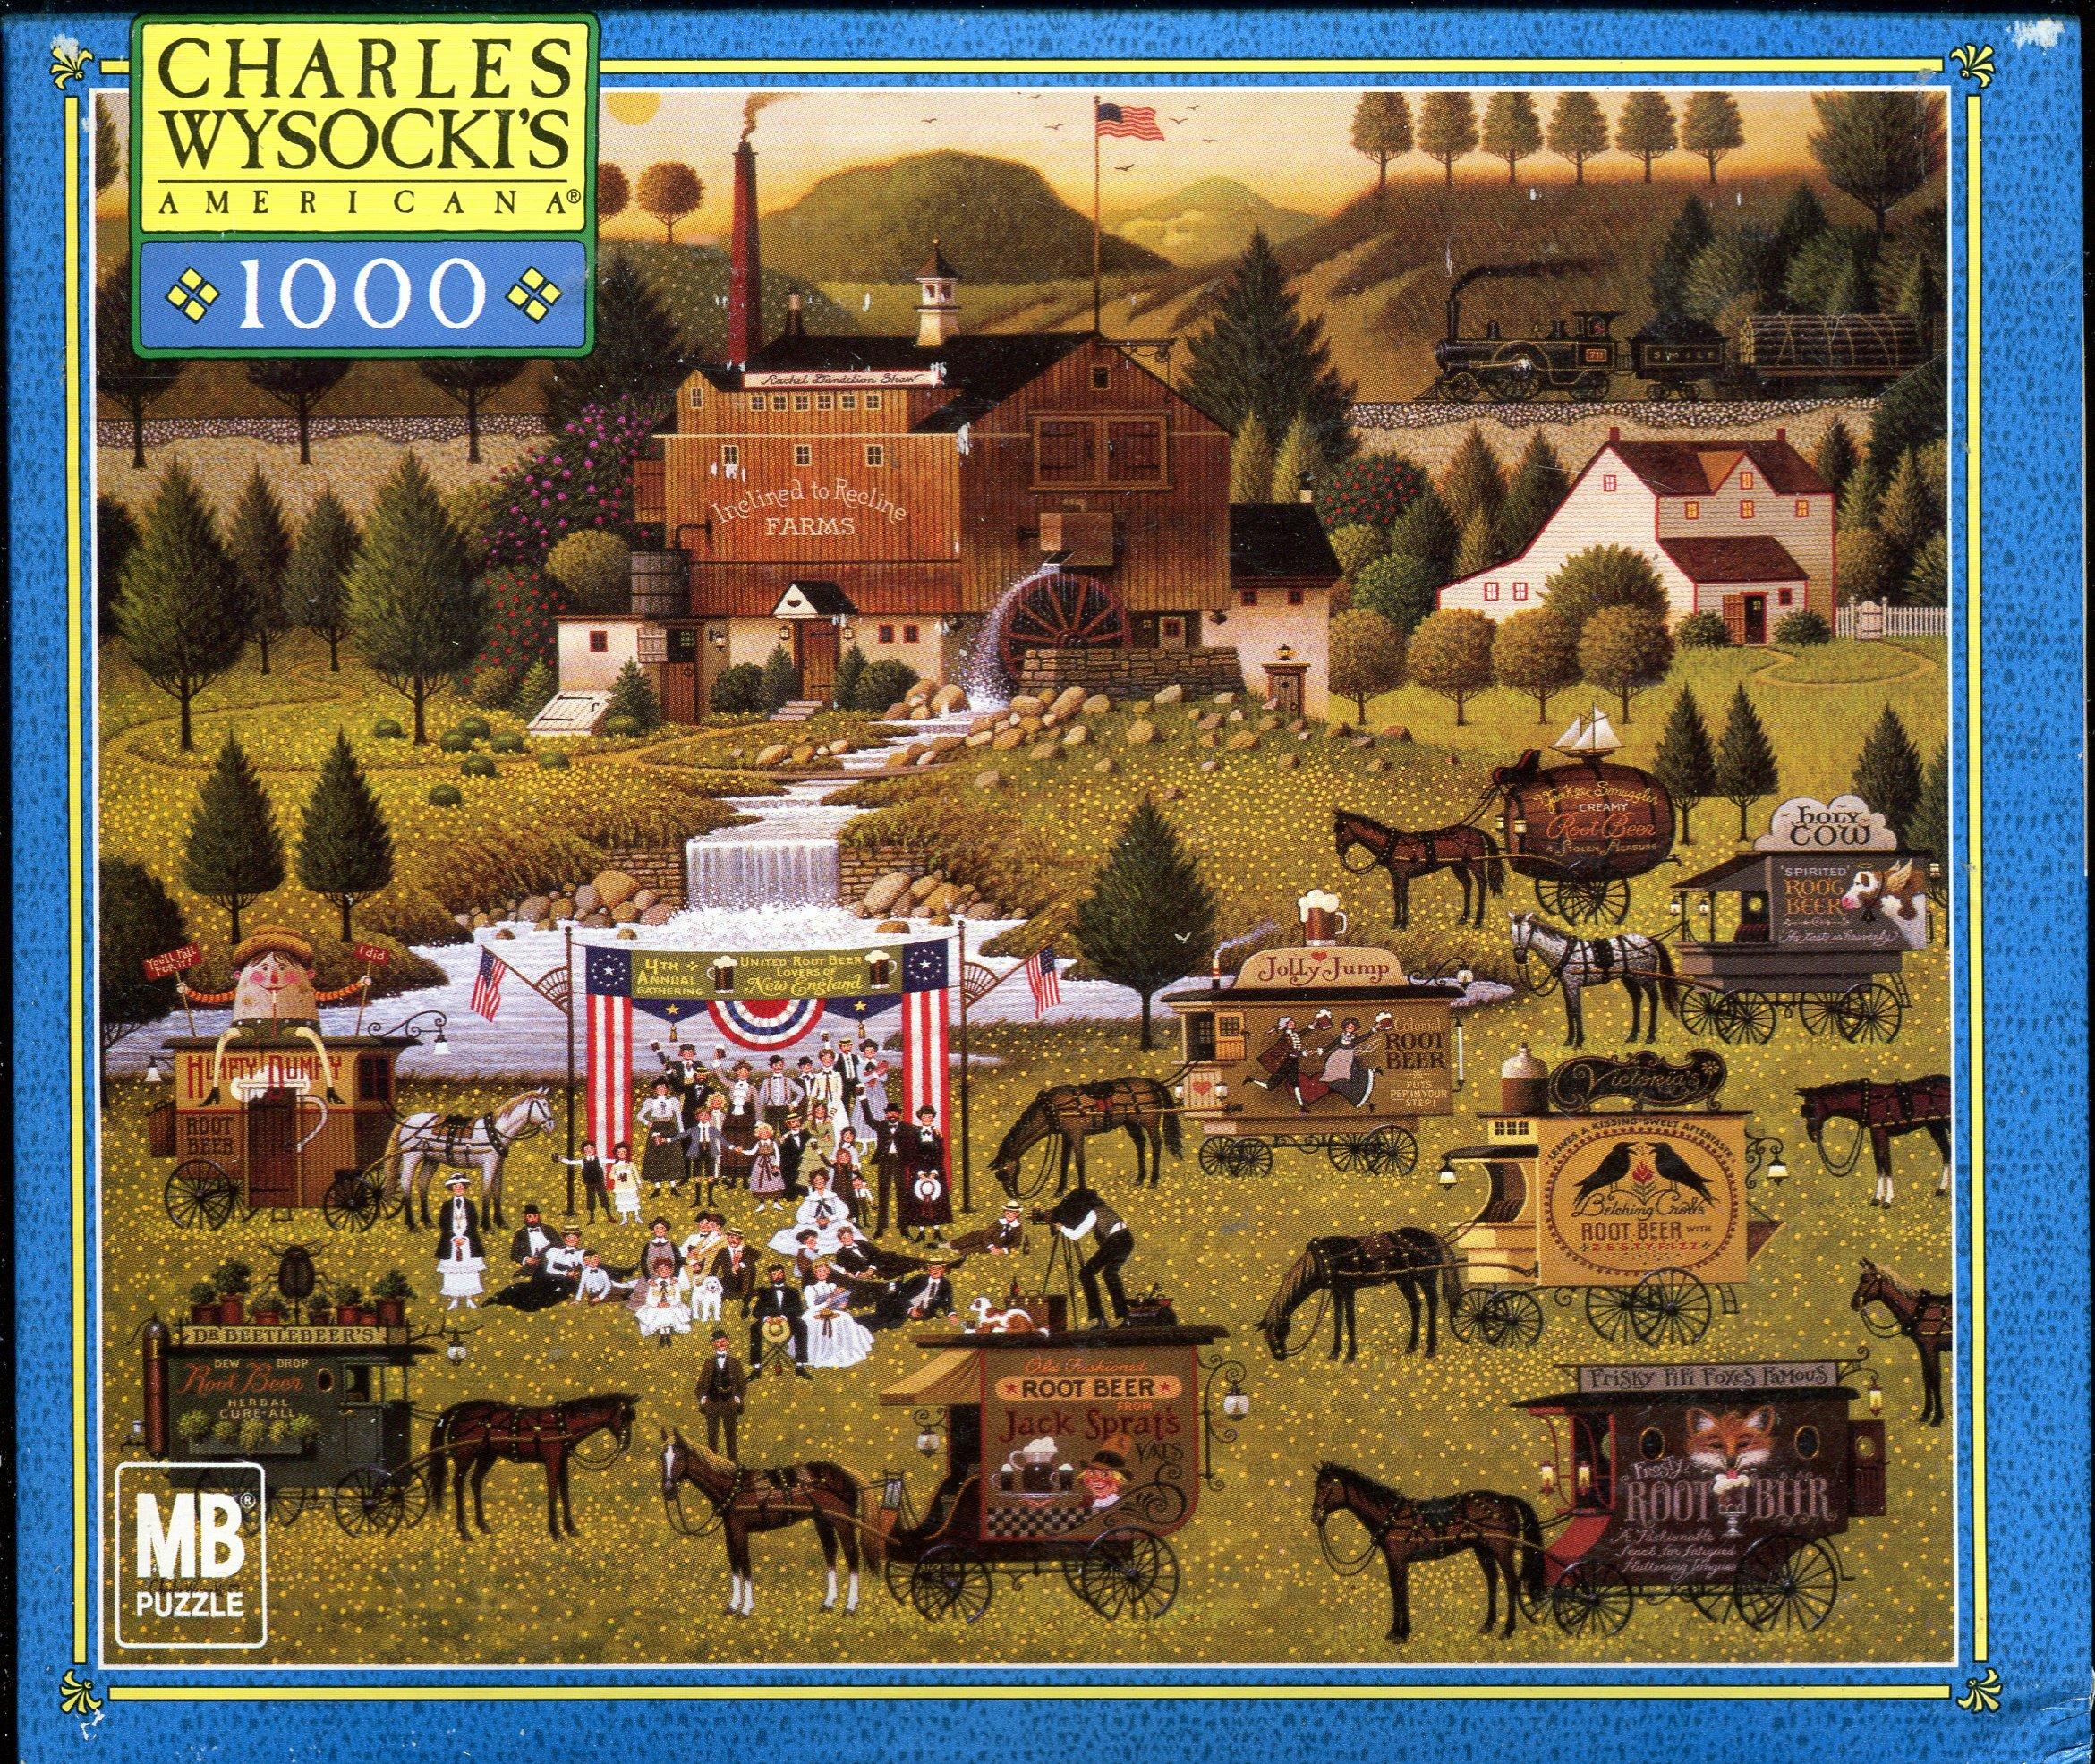 Charles Wysocki's American 1,000 Piece Jigsaw Puzzle ~ Rally At Dandelion Mill 04679-12 pdf